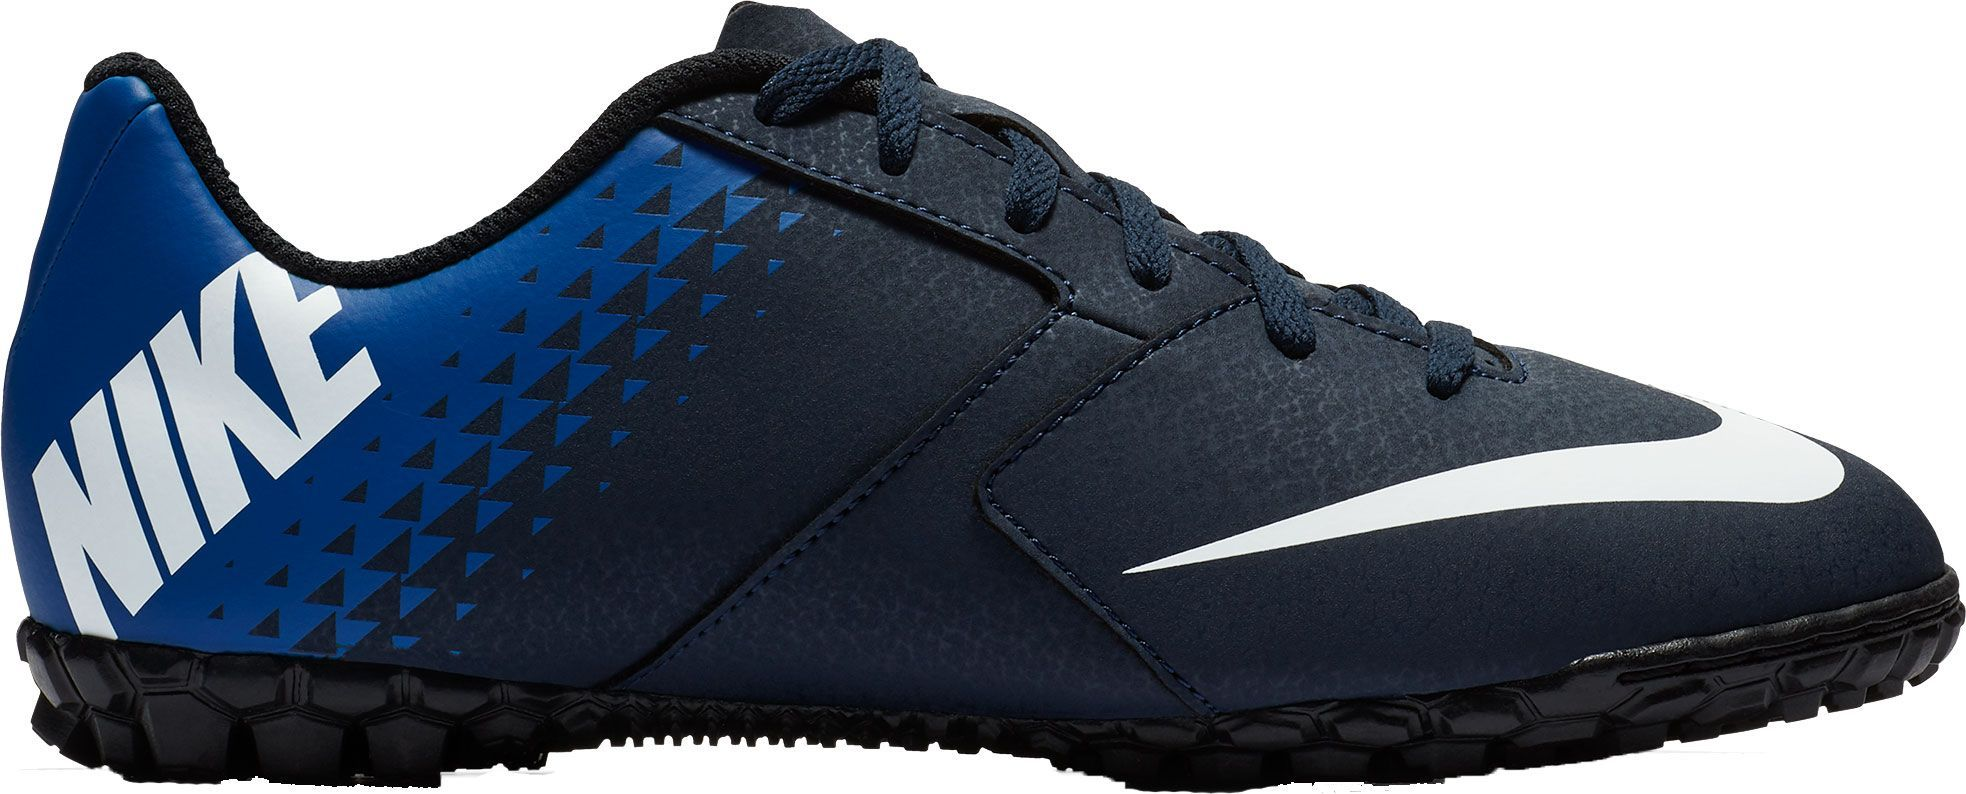 reputable site a3fbe 55478 Nike Kids  BombaX Turf Soccer Cleats, Blue